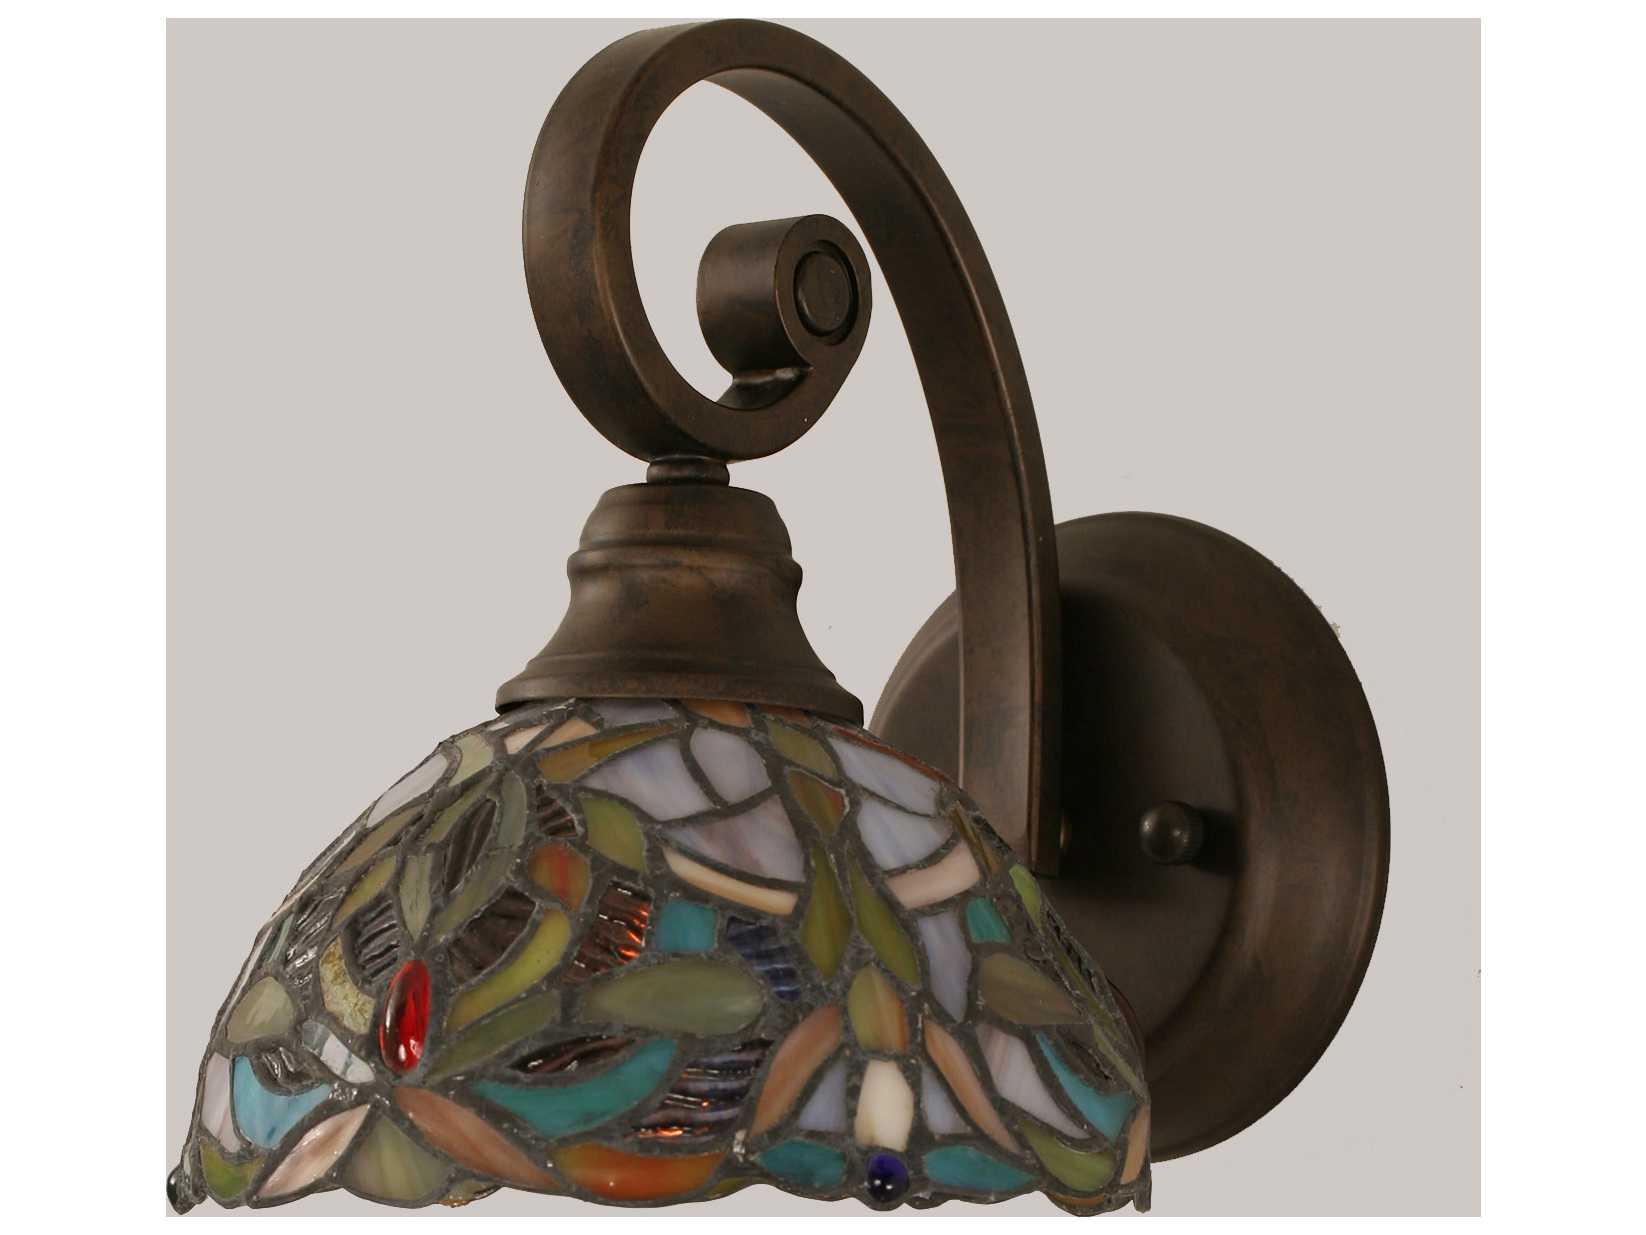 Small Tiffany Wall Lights : Toltec Lighting Curl Bronze & Kaleidoscope Mini Tiffany Glass Wall Sconce TOL151BRZ9905